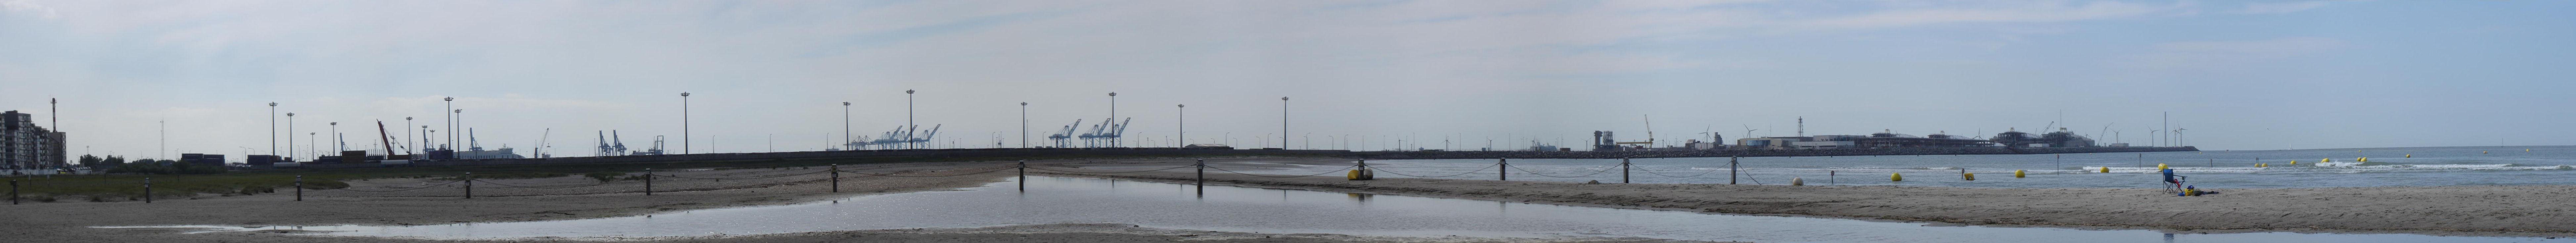 Zeebrugge_-_Pano_1.jpg